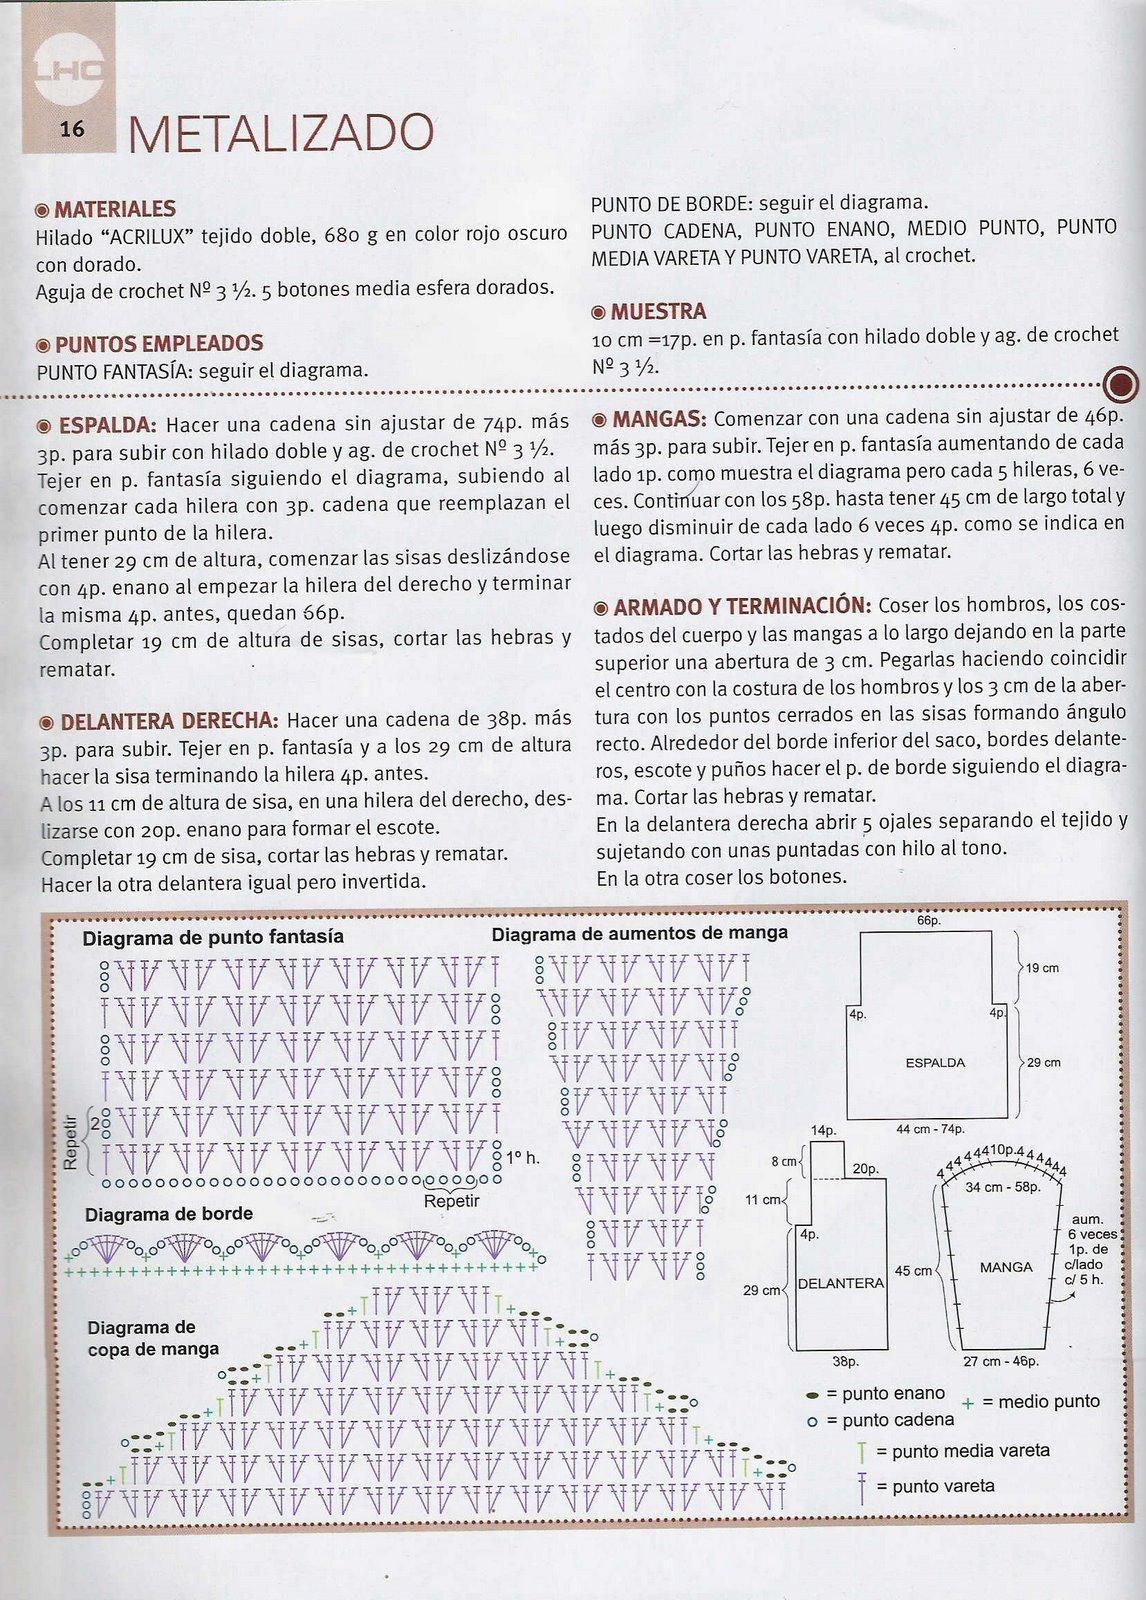 3 MODELOS DE CHAQUETAS A CROCHET - gráficos Navegando... he ...